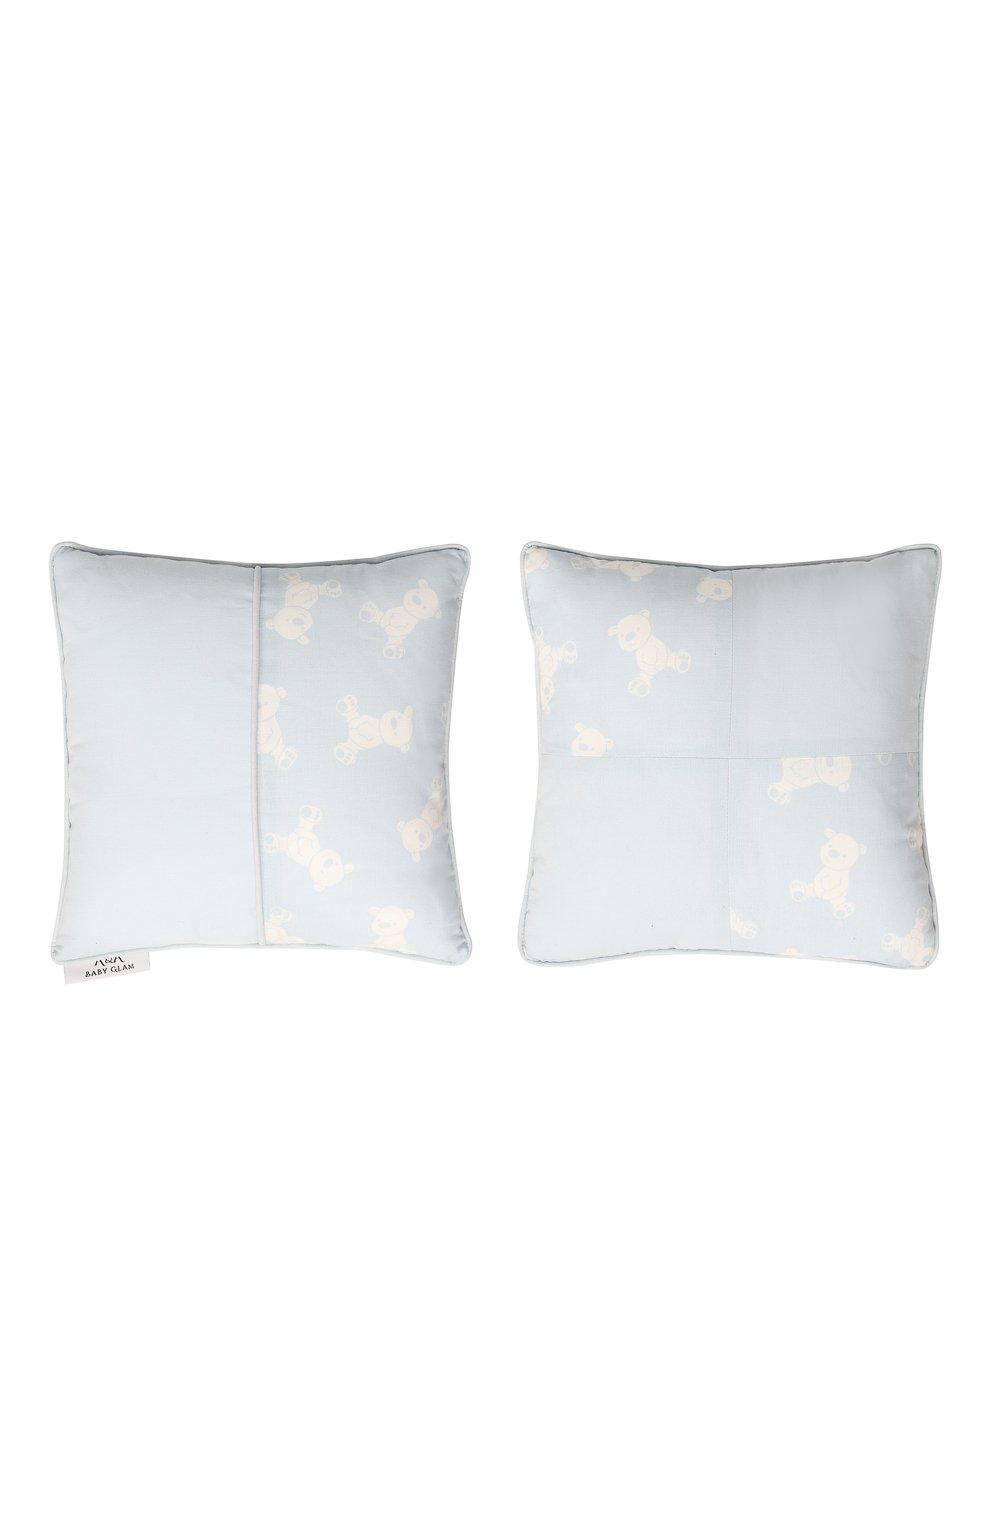 Детского комплект для кровати A&A BABY GLAM голубого цвета, арт. M7 BL 0301 12565 4 | Фото 7